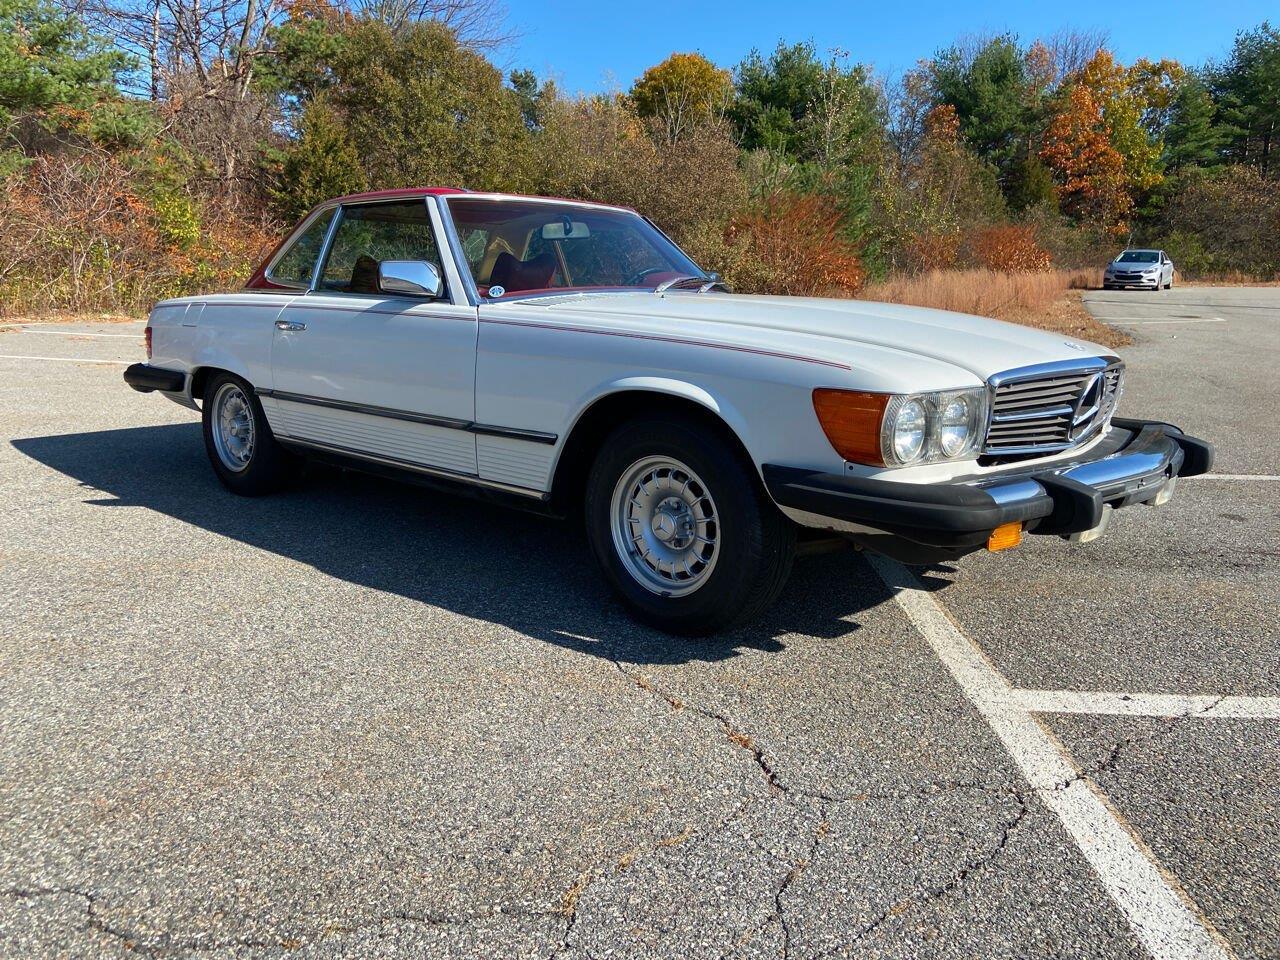 1978 Mercedes-Benz 450SL (CC-1420506) for sale in Westford, Massachusetts